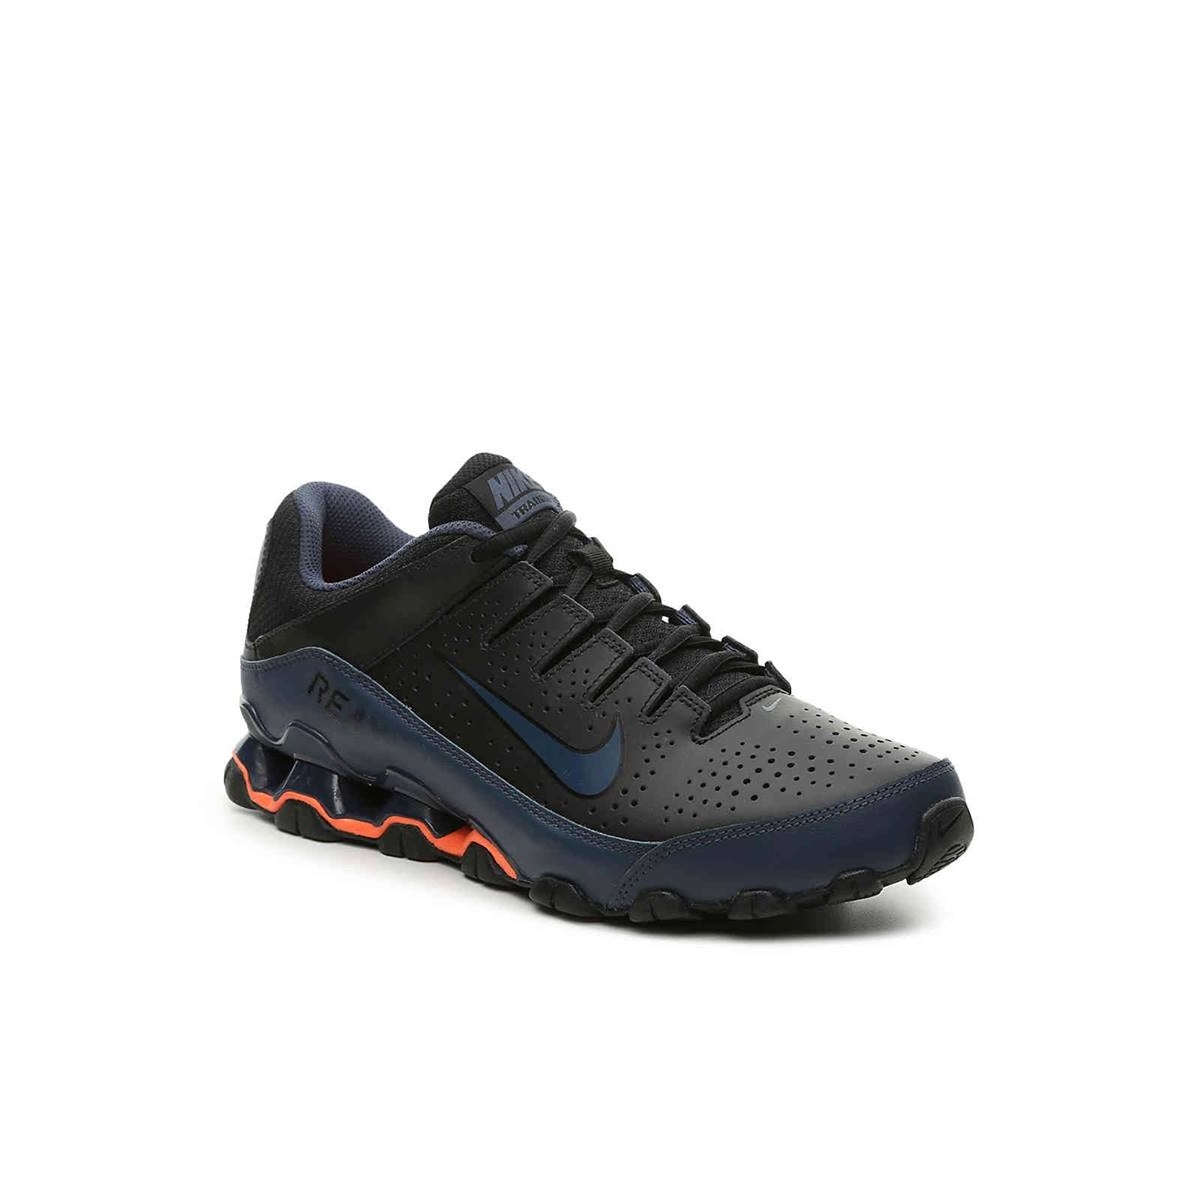 Reax Tr 8 Scarpa Uomo 616272 046 Training Nike Scarpe Nero F5CCpq